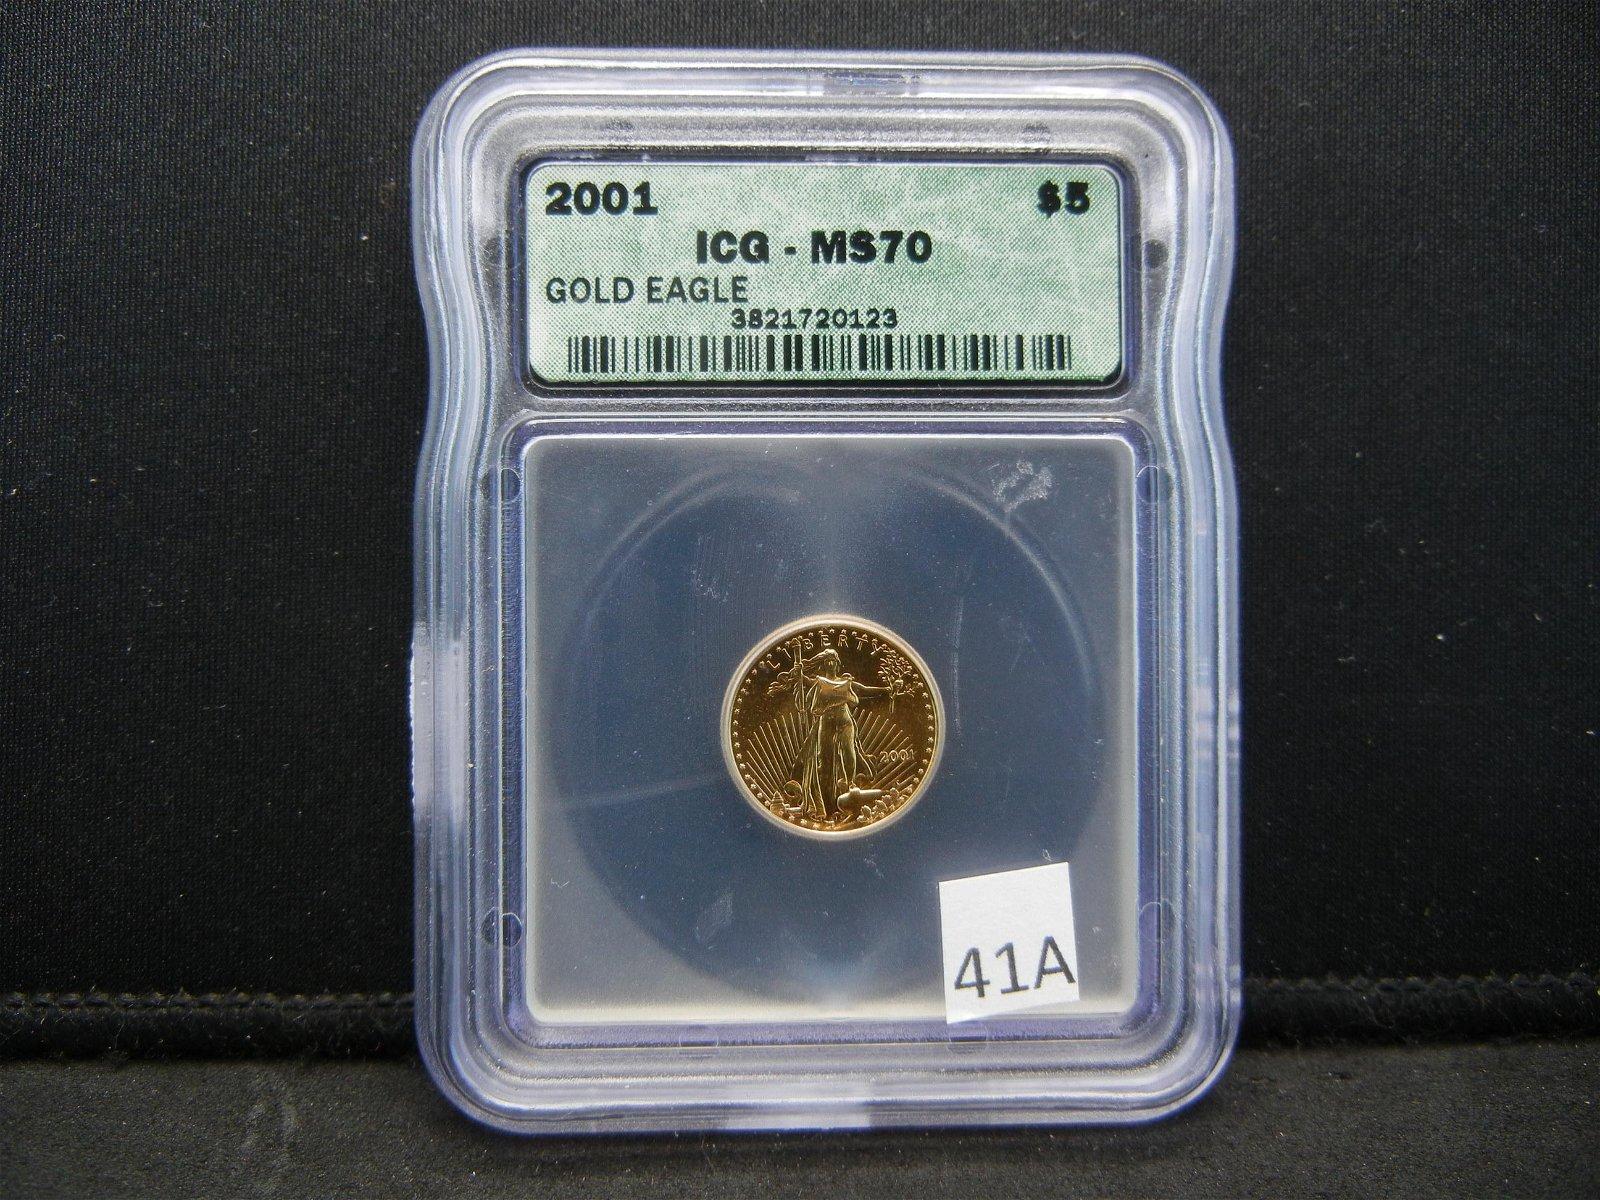 2001 Gold Eagle Five Dollar ICG MS70